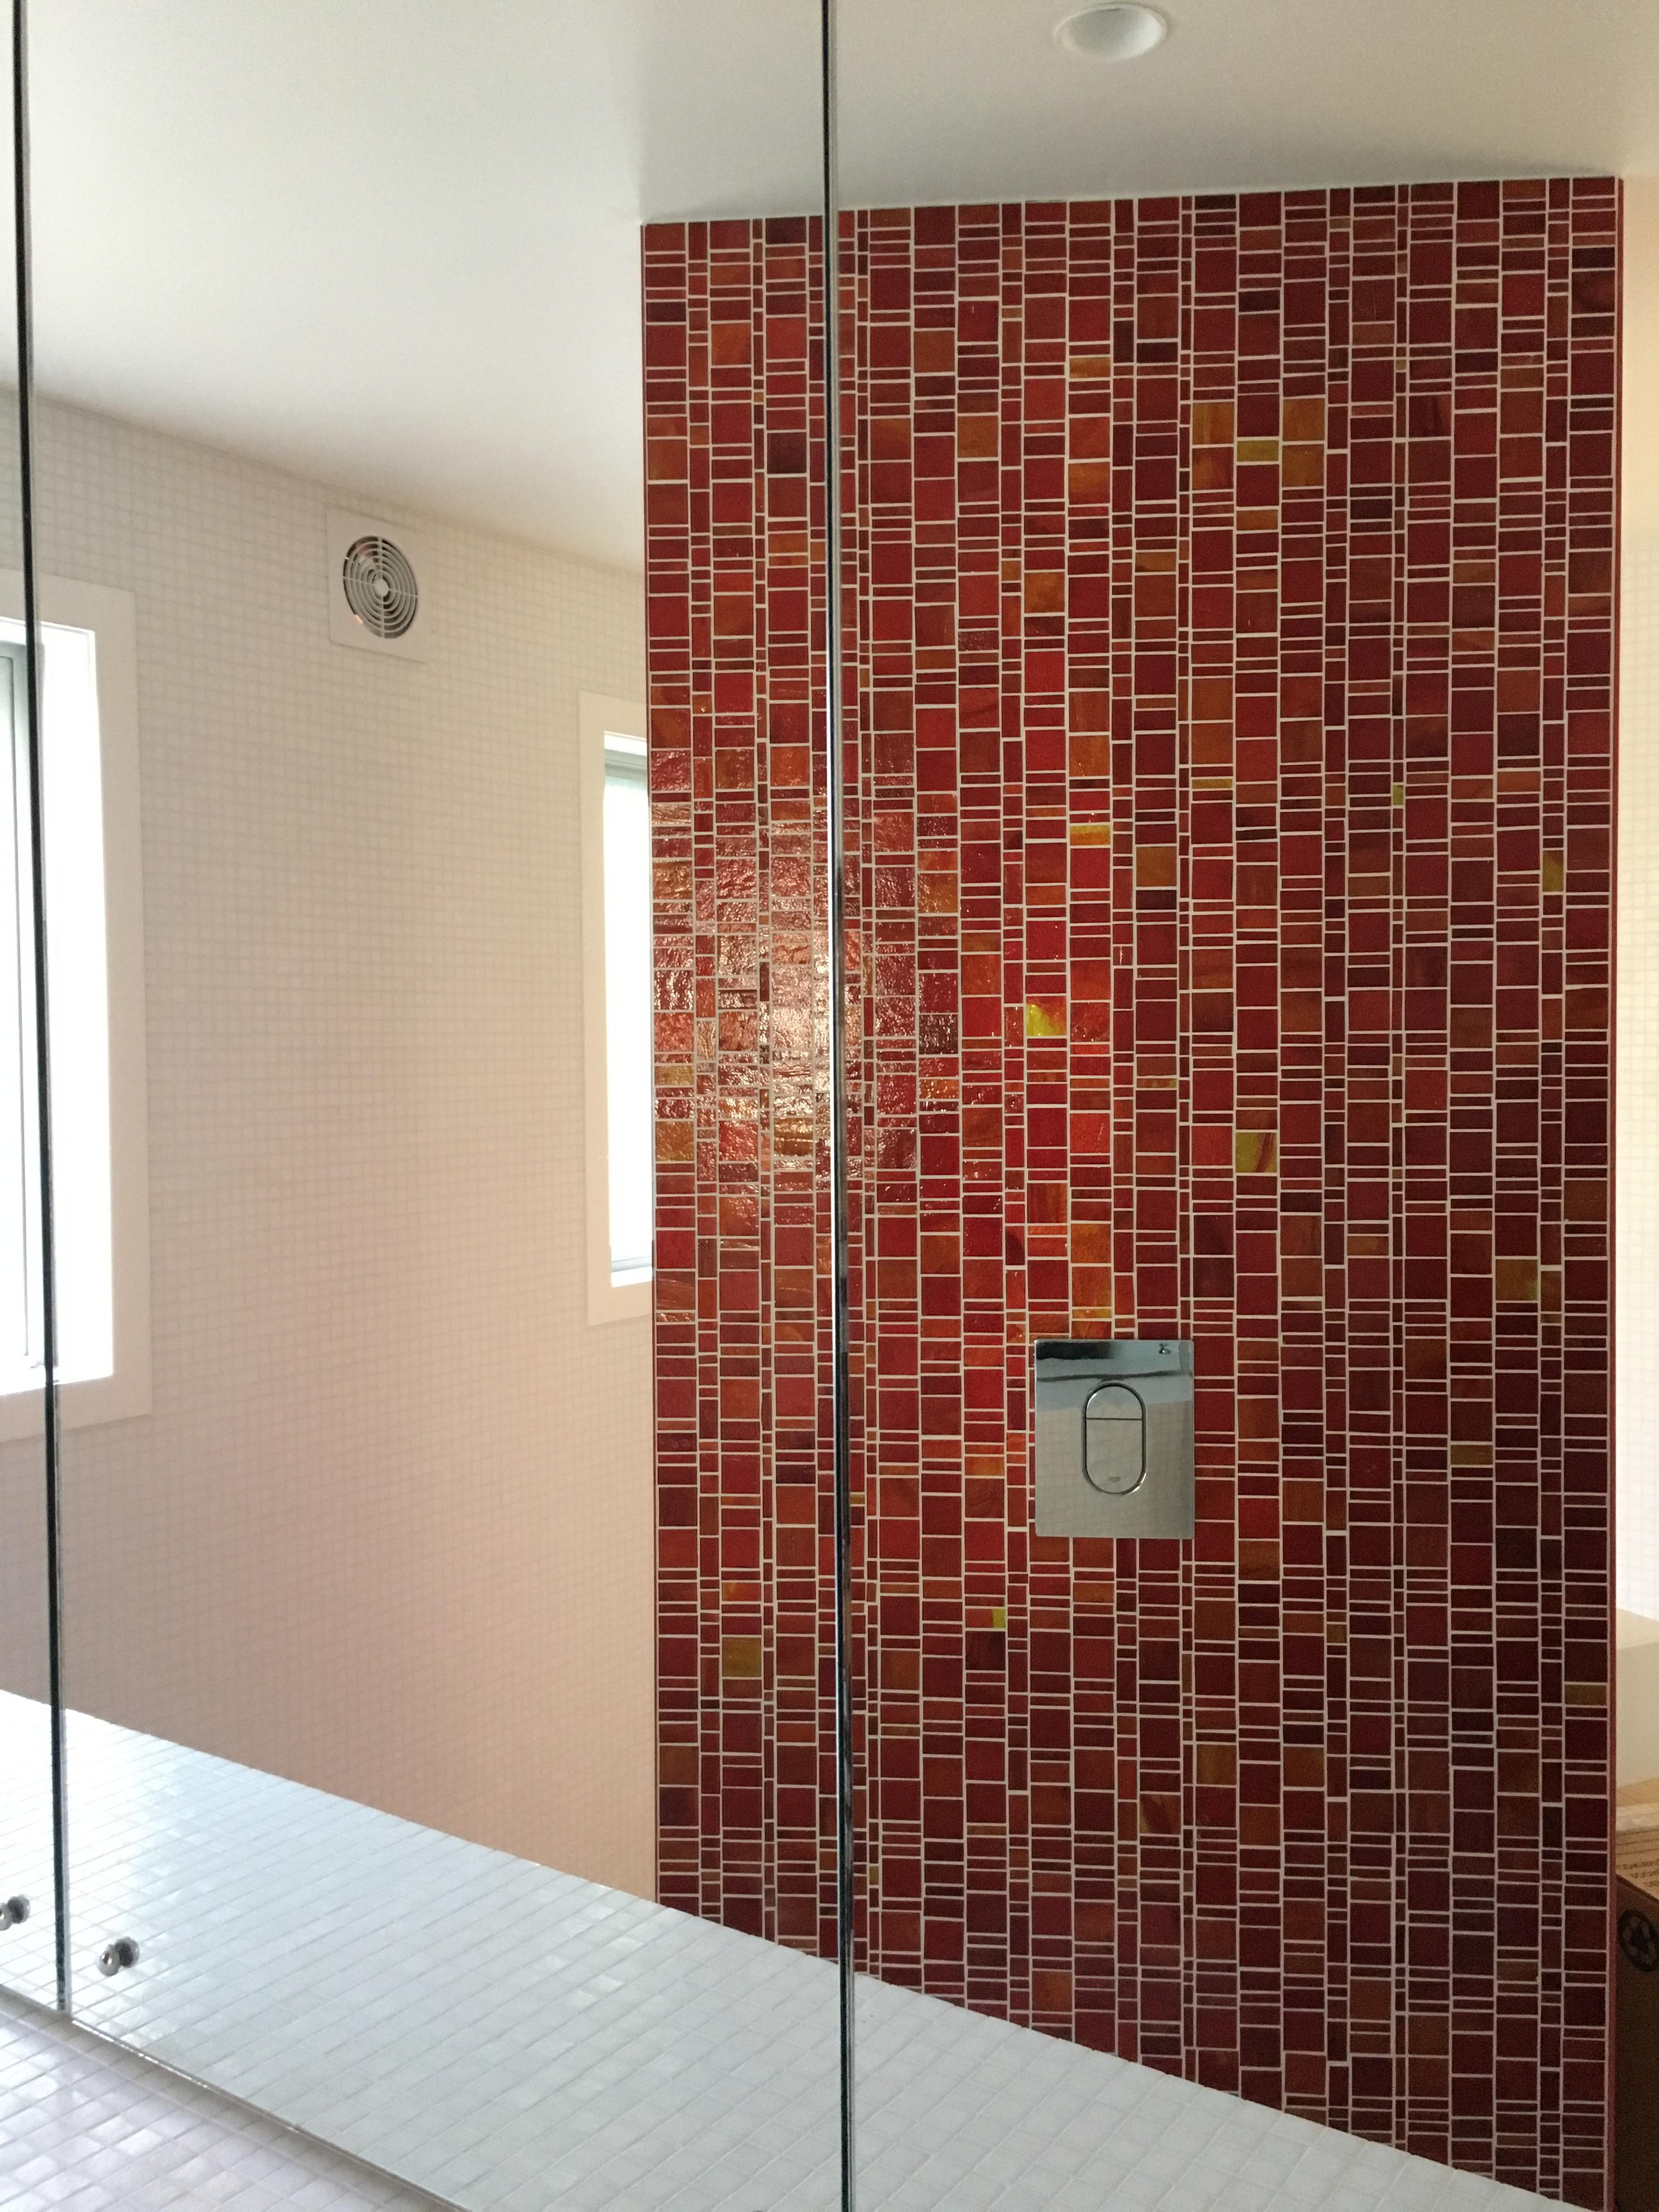 Interior Tiling Photo